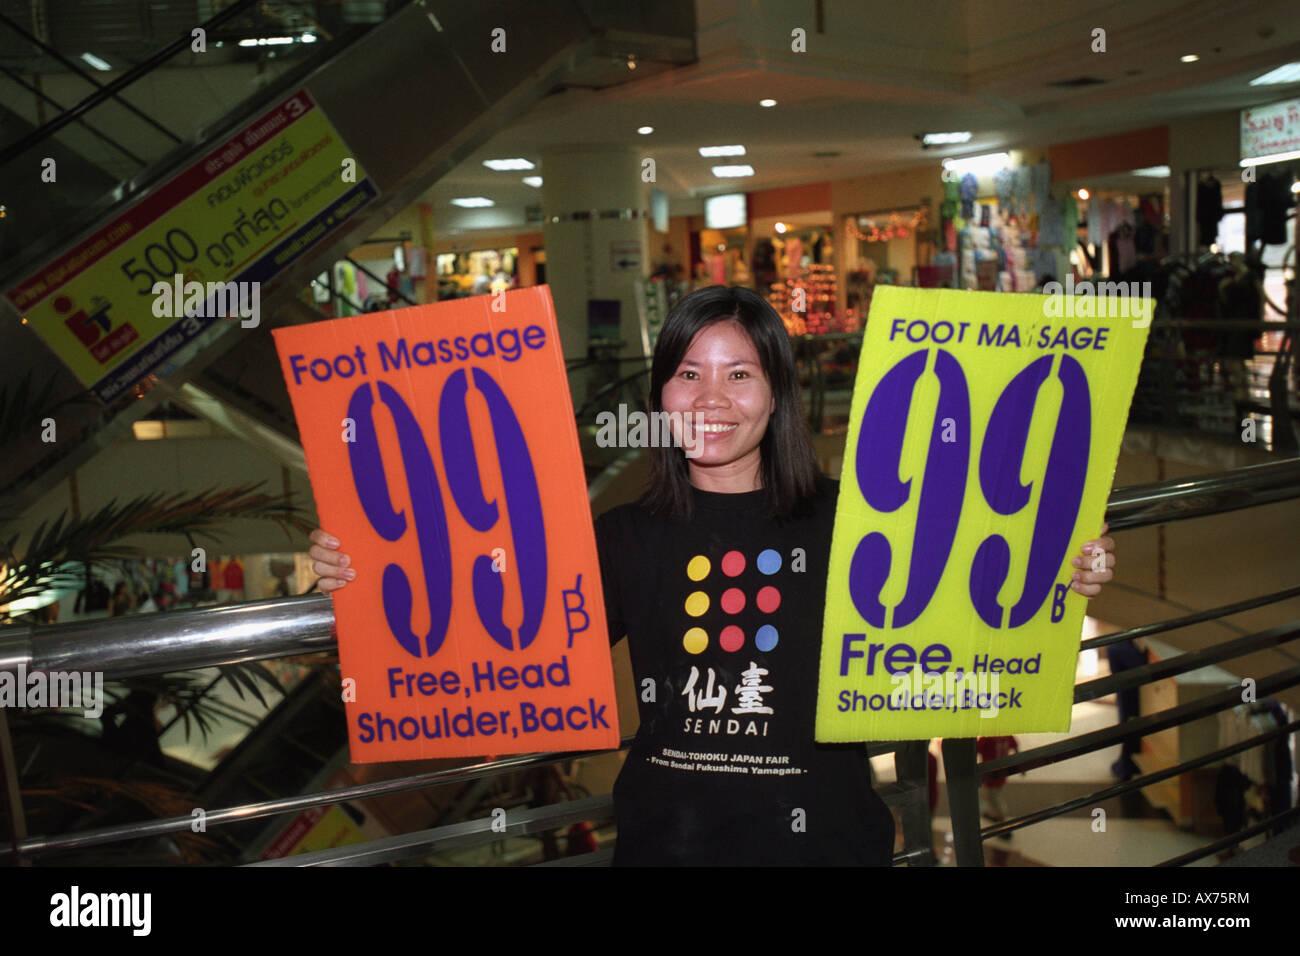 Thai Fuß Massage Verkauf für 99 Baht, im Zentrum Pratunam, Bangkok. Stockbild